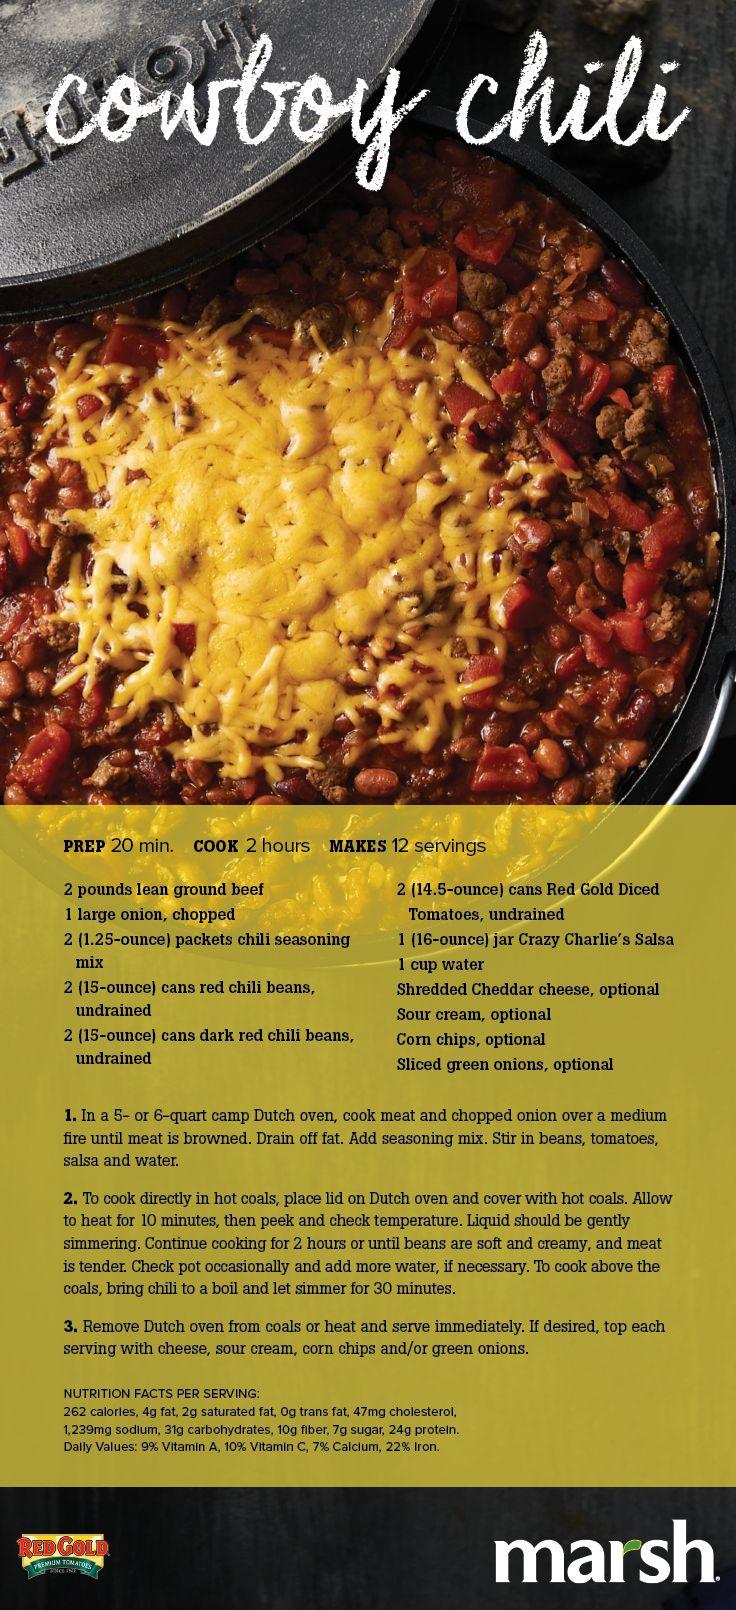 Cheap Meals Cook 2